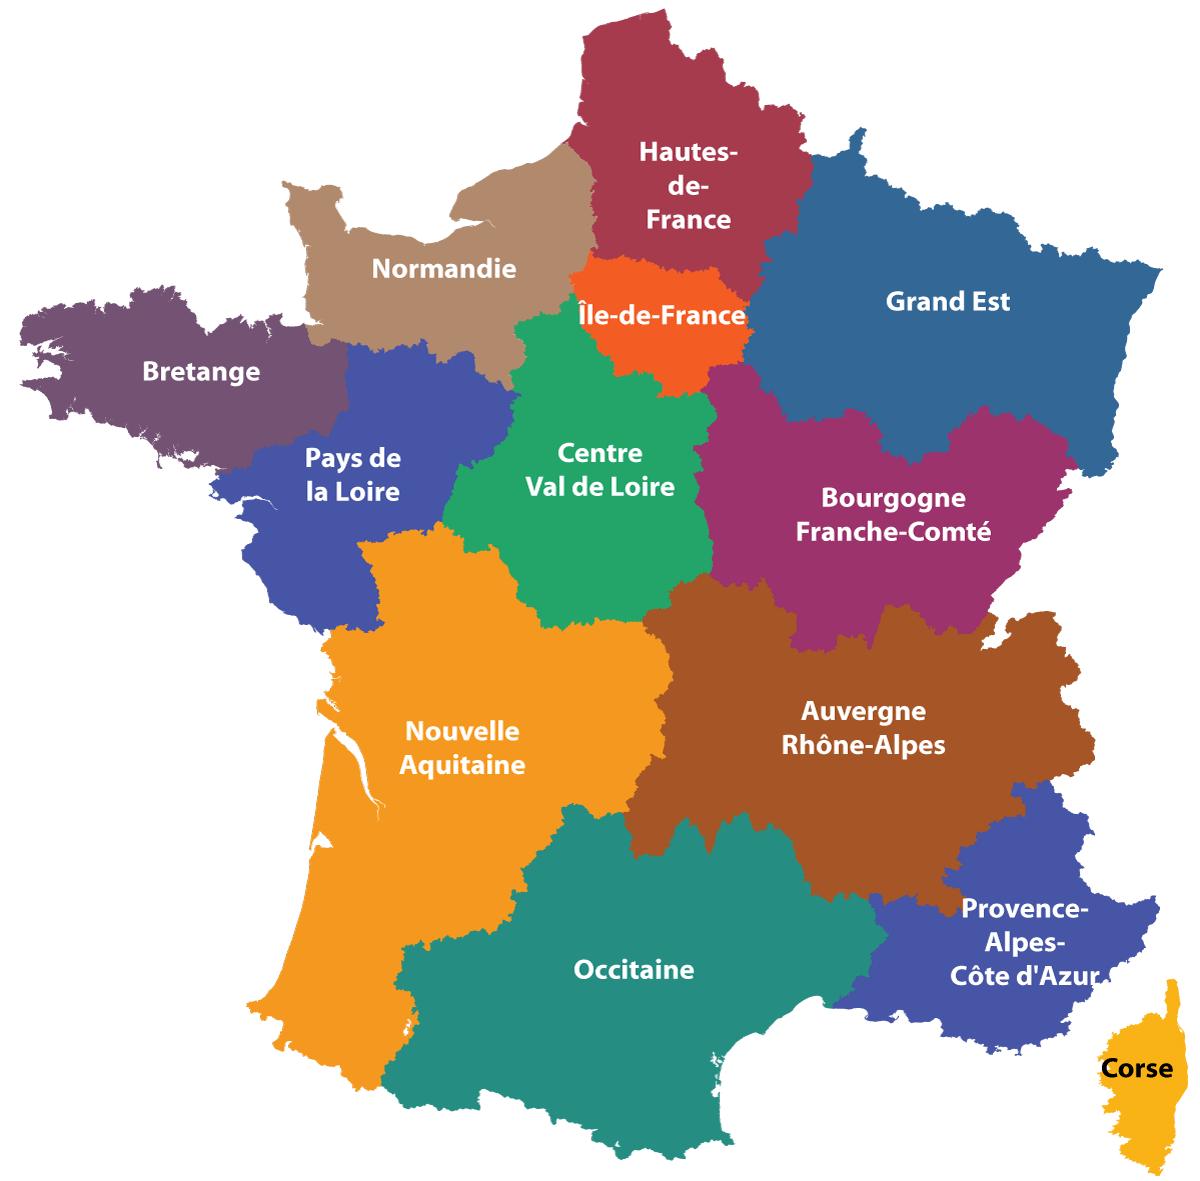 Maps Of The Regions Of France dedans Map De France Regions